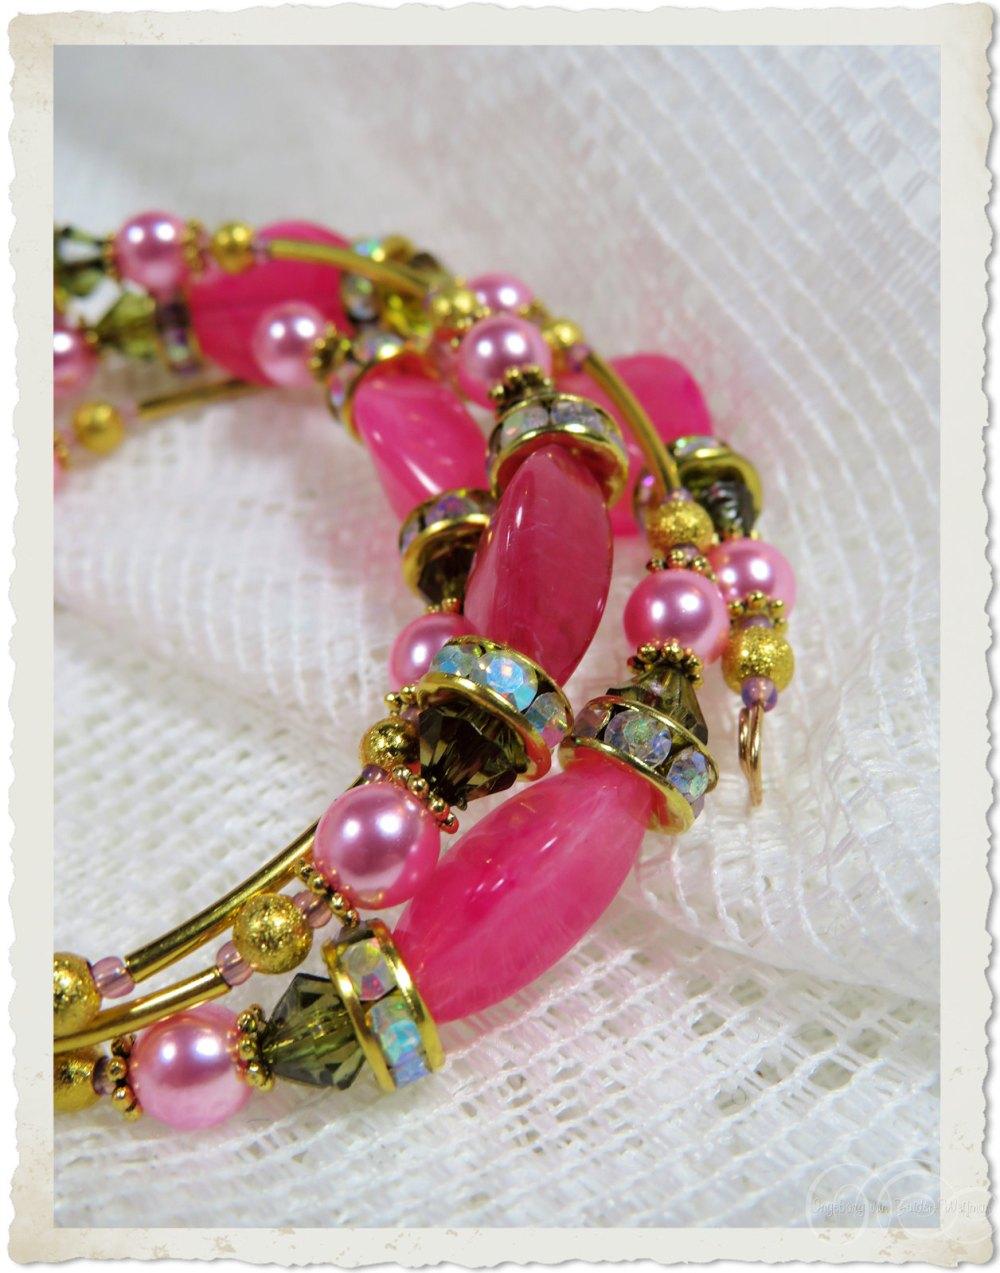 Details of pink bling memory wire bracelet